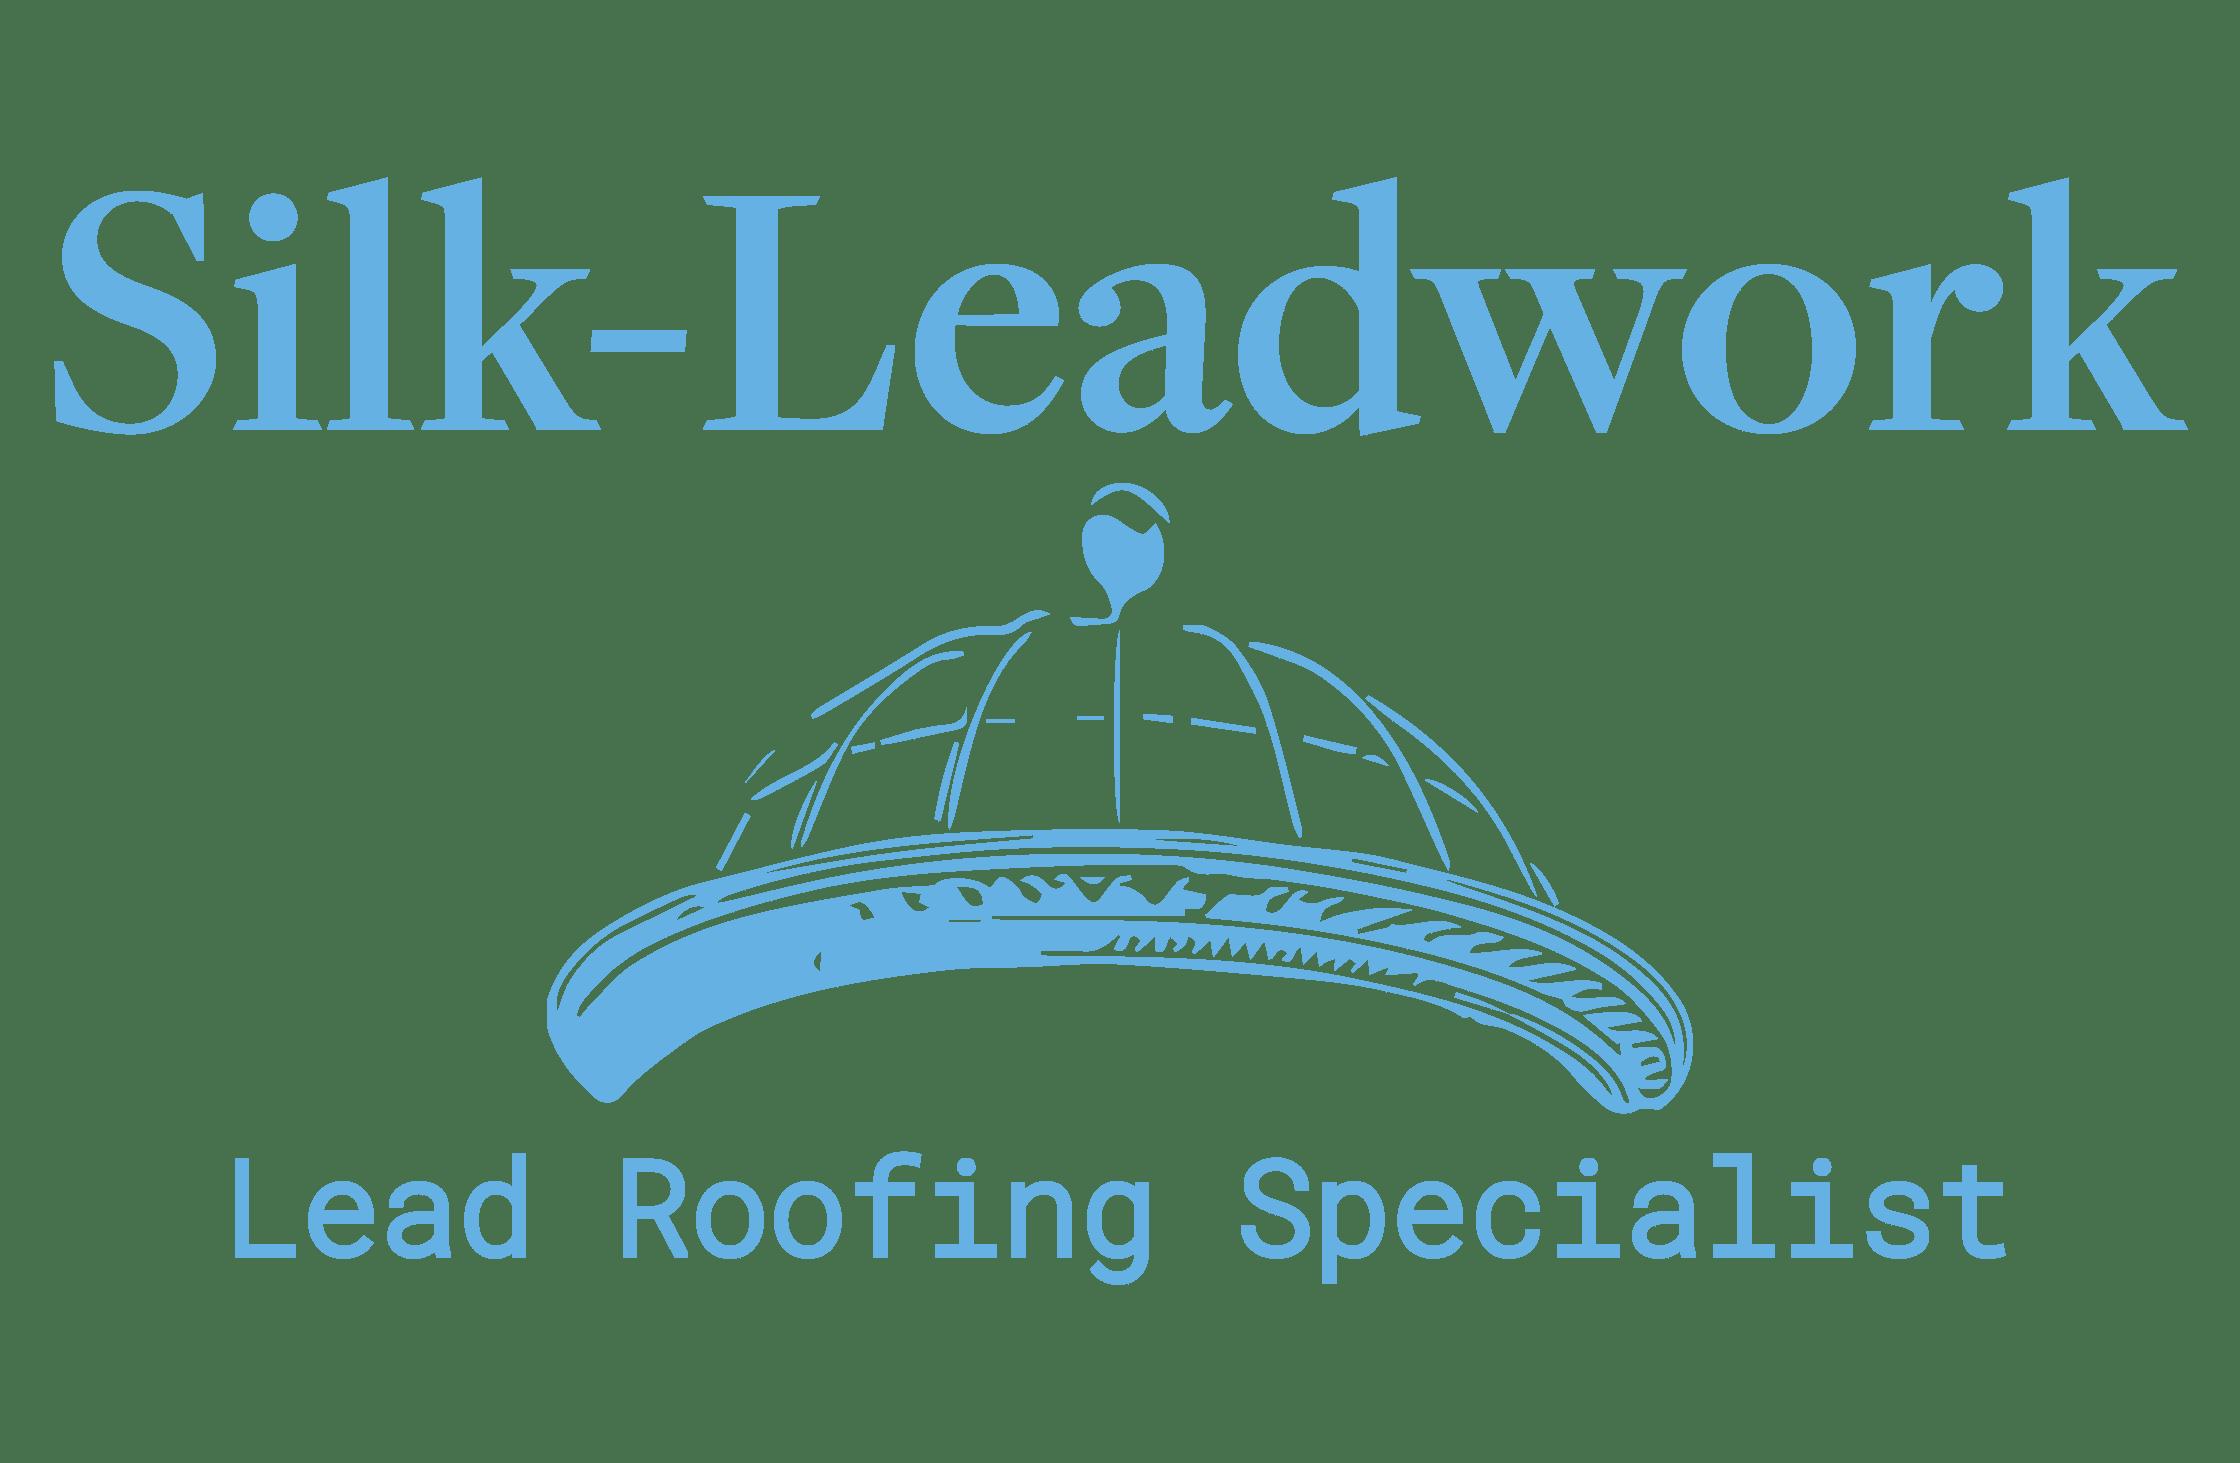 Lead Roofing | Slik-Leadwork